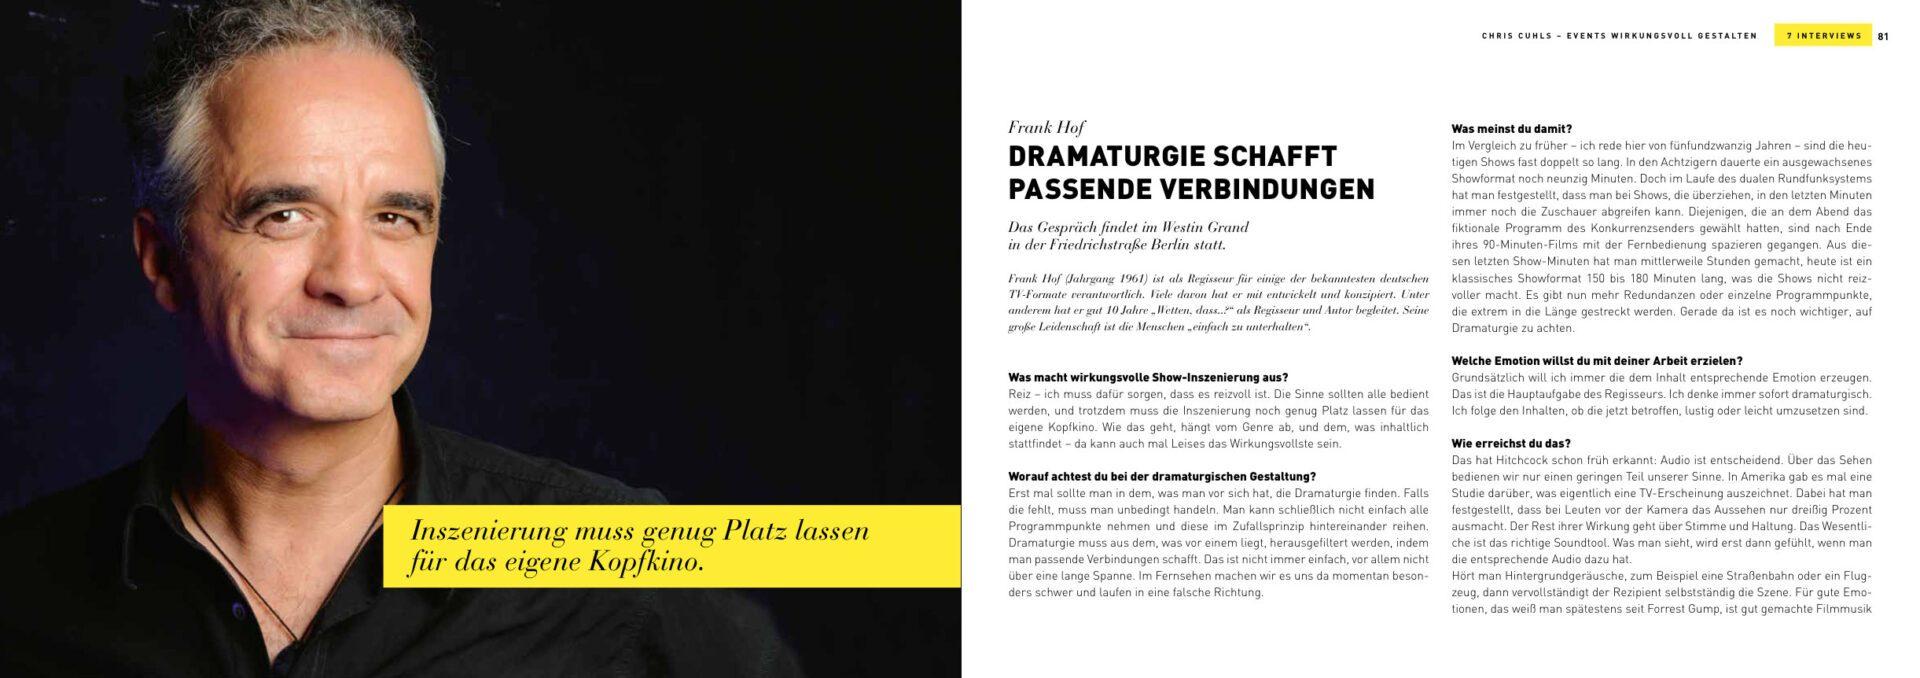 TV Regisseur Frank Hof - Events wirkungsvoll inszenieren